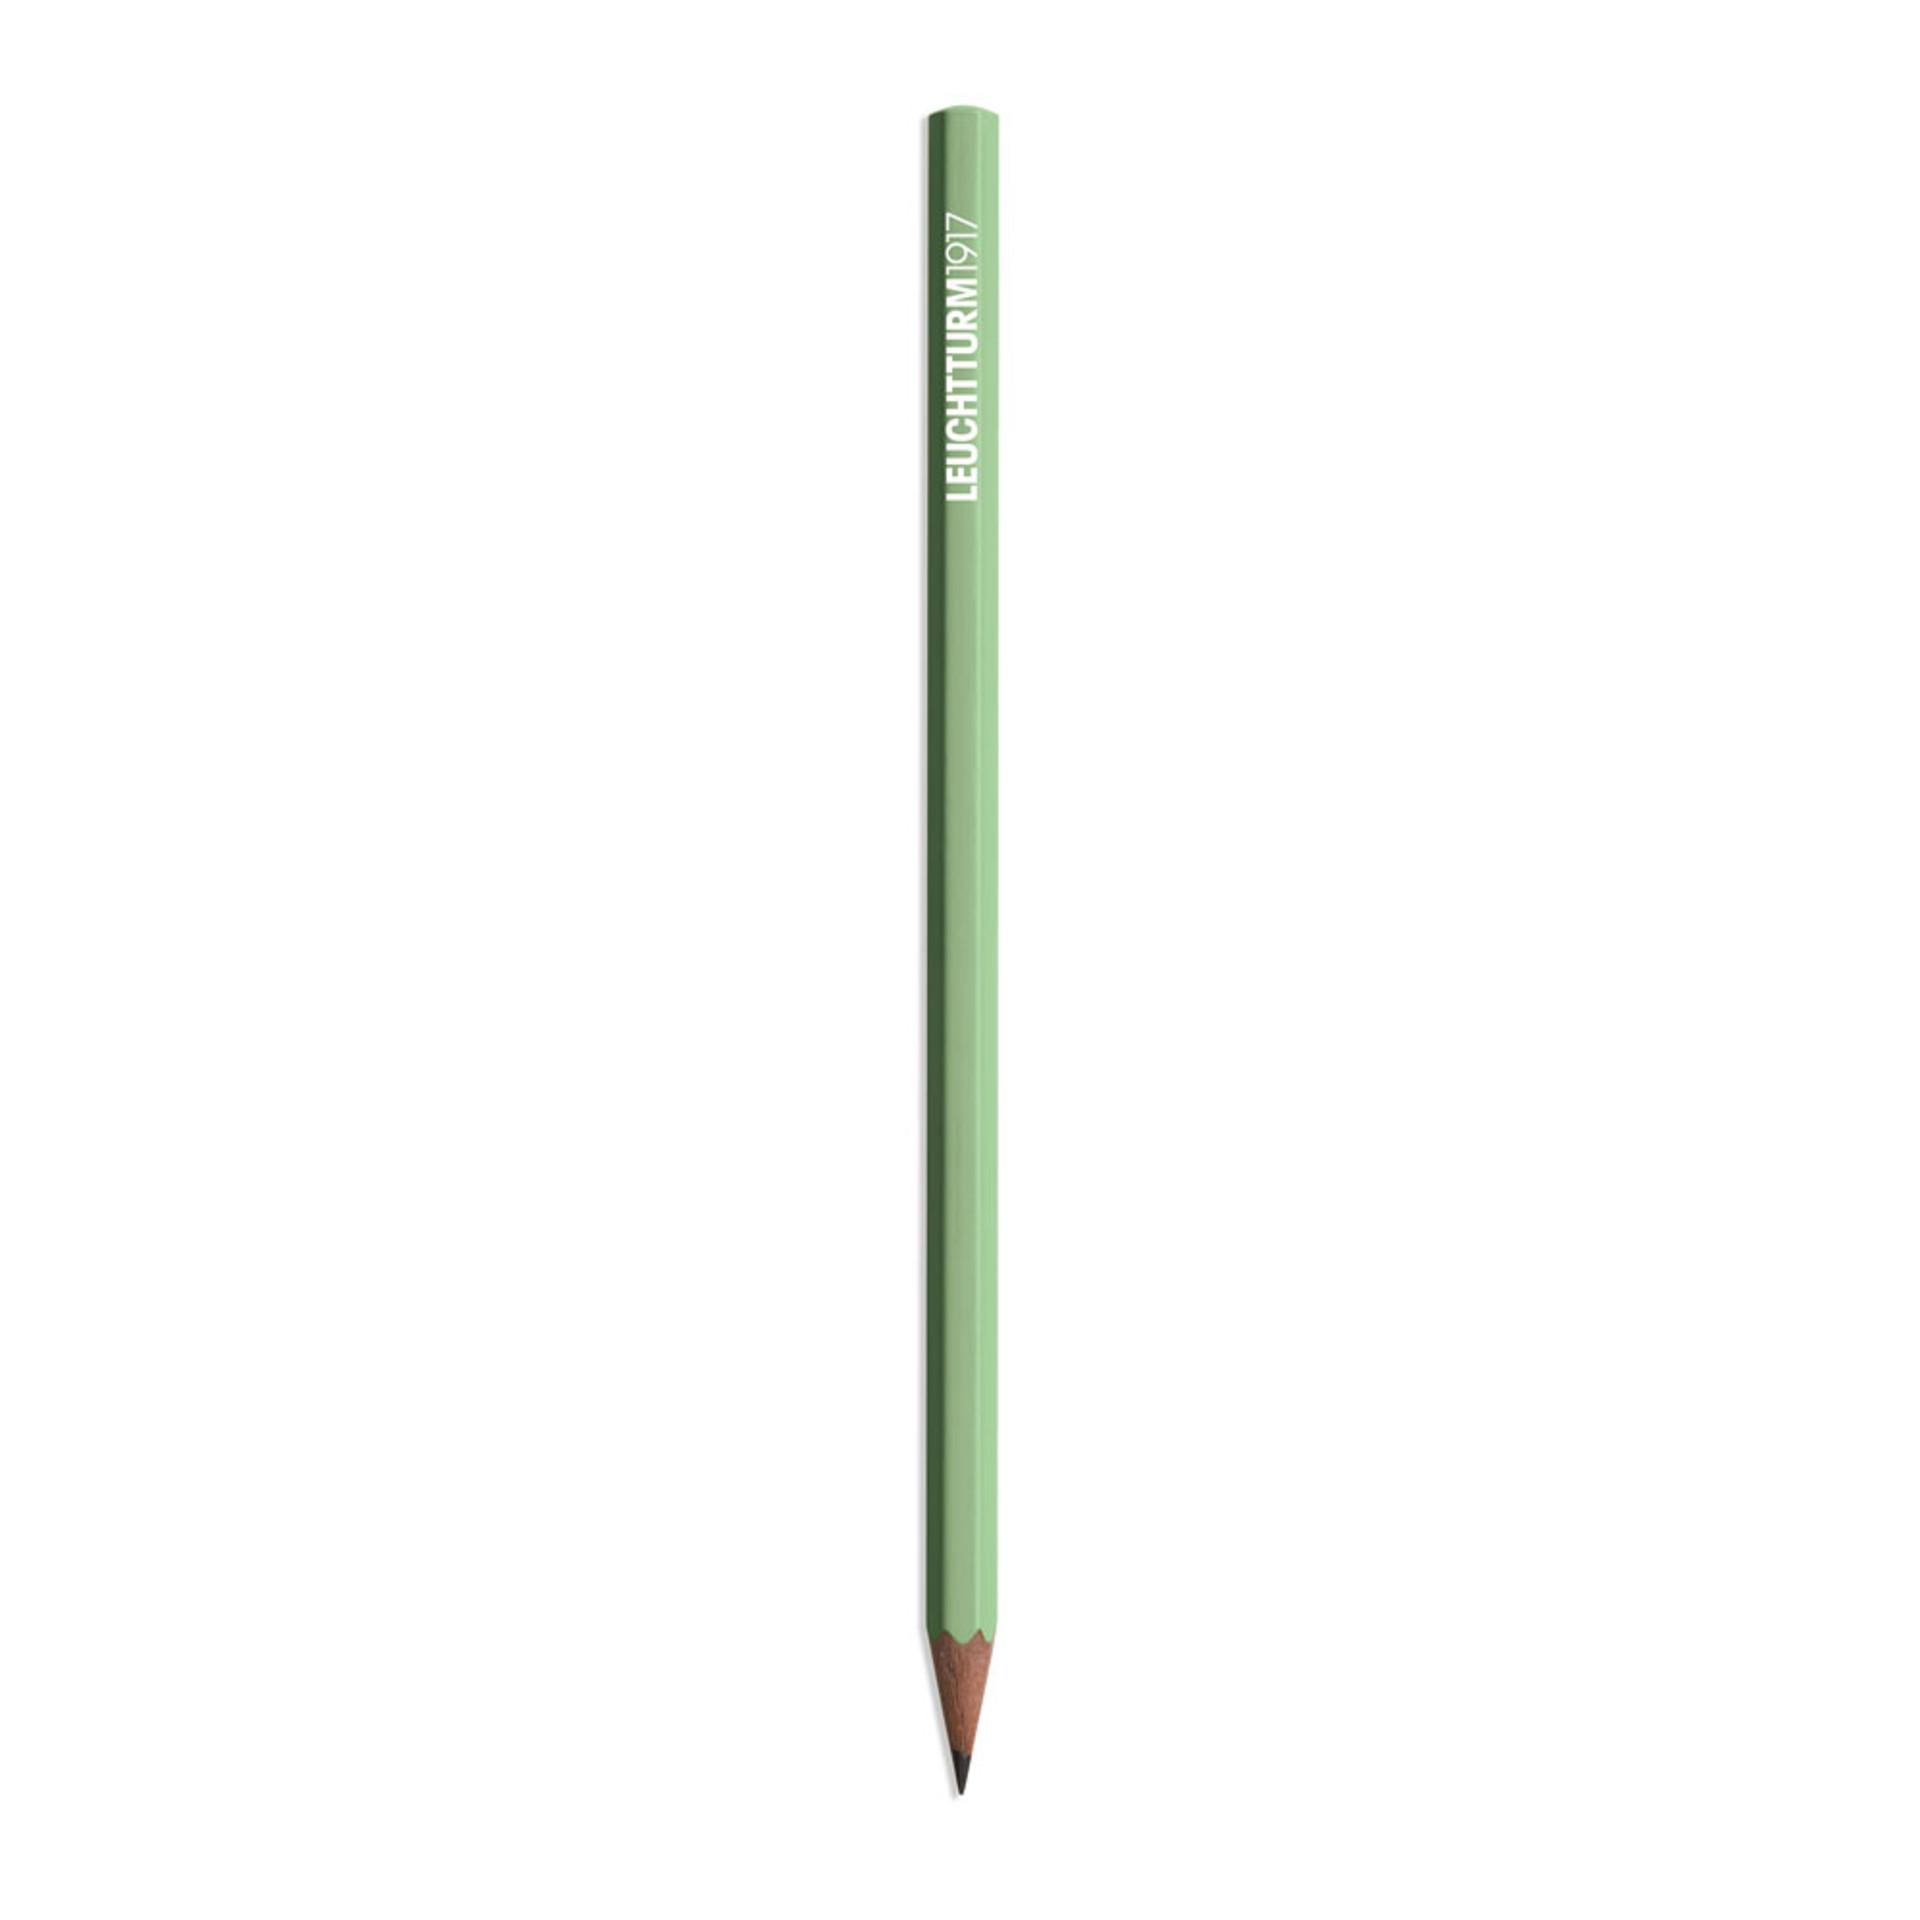 Leuchtturm 1917 Black HB Lead Woodcase Pencil – Sage